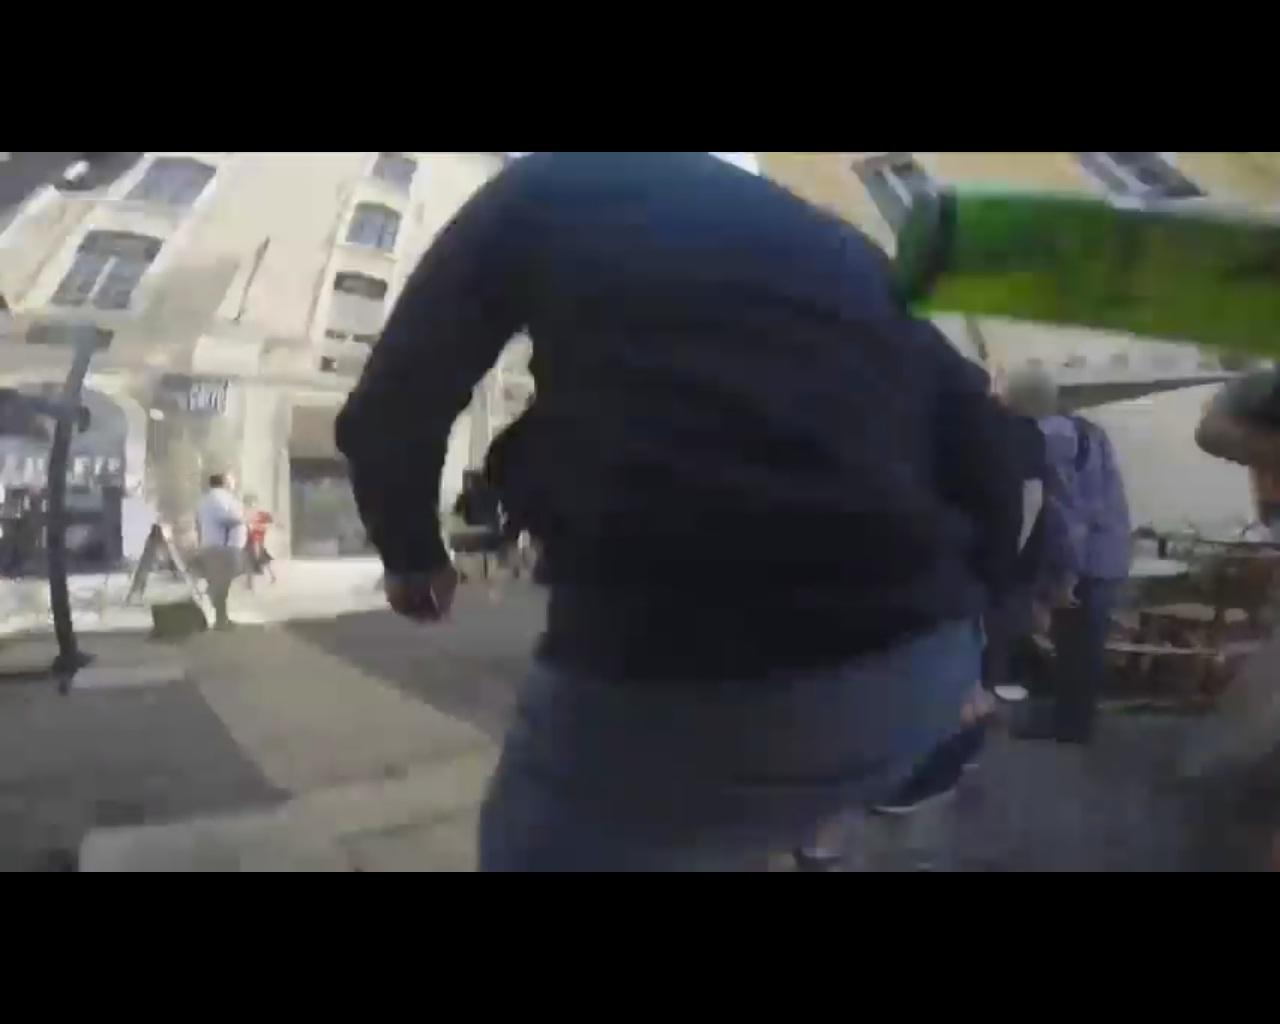 Экшн ВИДЕО! Драка англичан с русскими снятая на GoPro (ВИДЕО 18+)